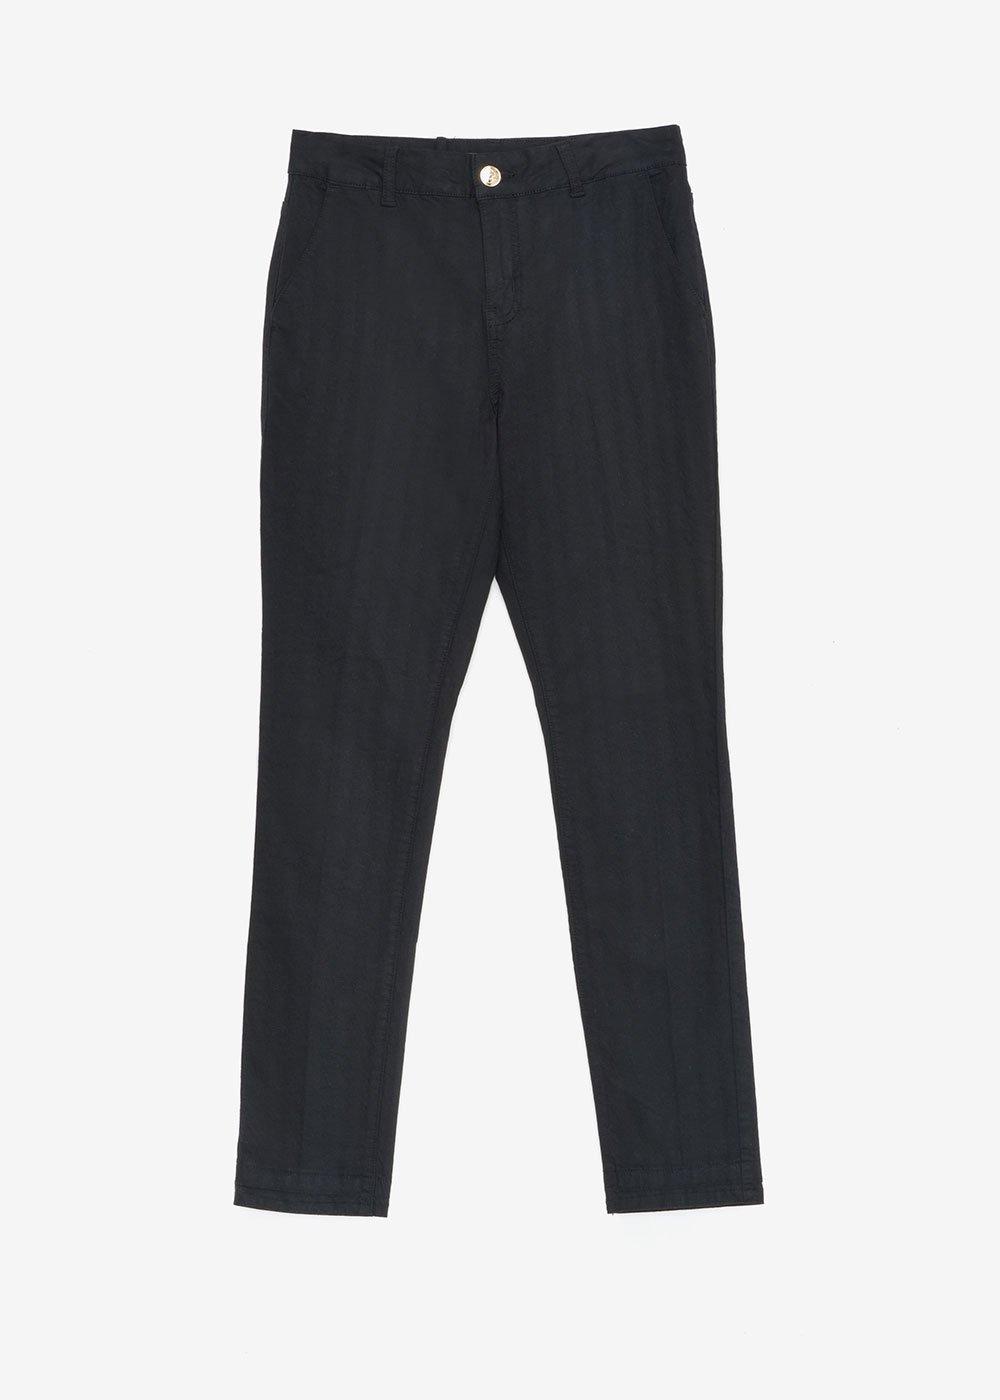 Pantalone Peggy misto cotone gamba slim - Black - Donna